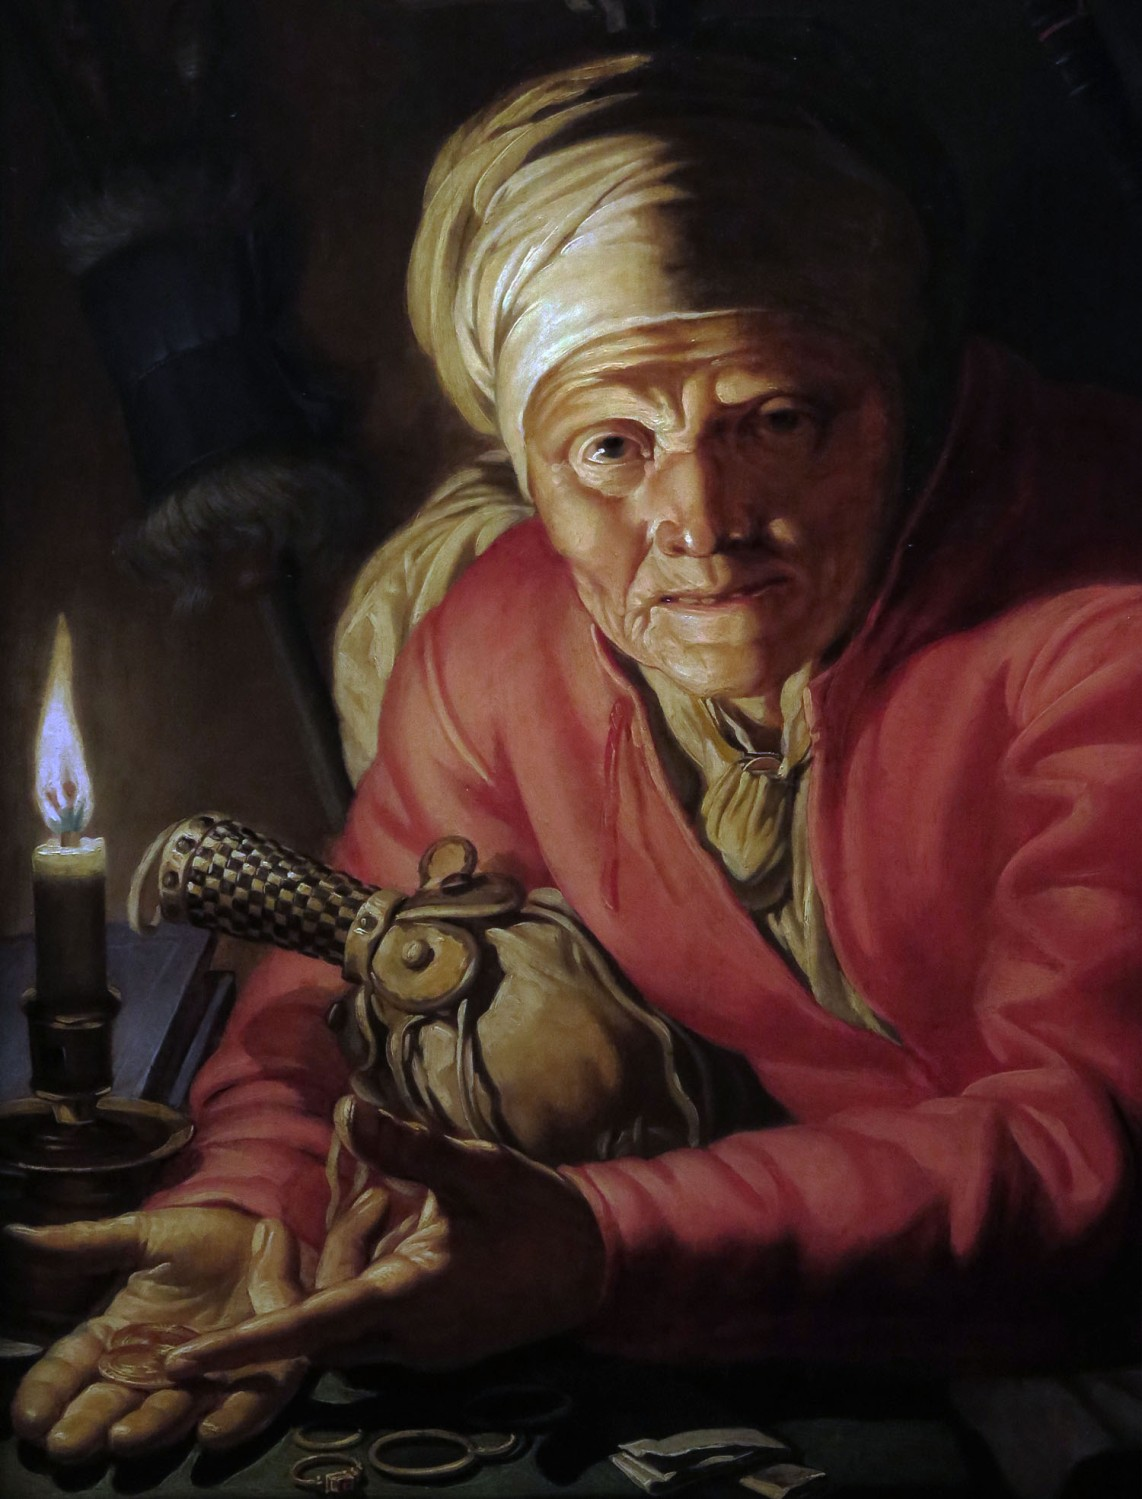 germany-dresden-zwinger-museum-art-insert-artist-miserly-old-woman